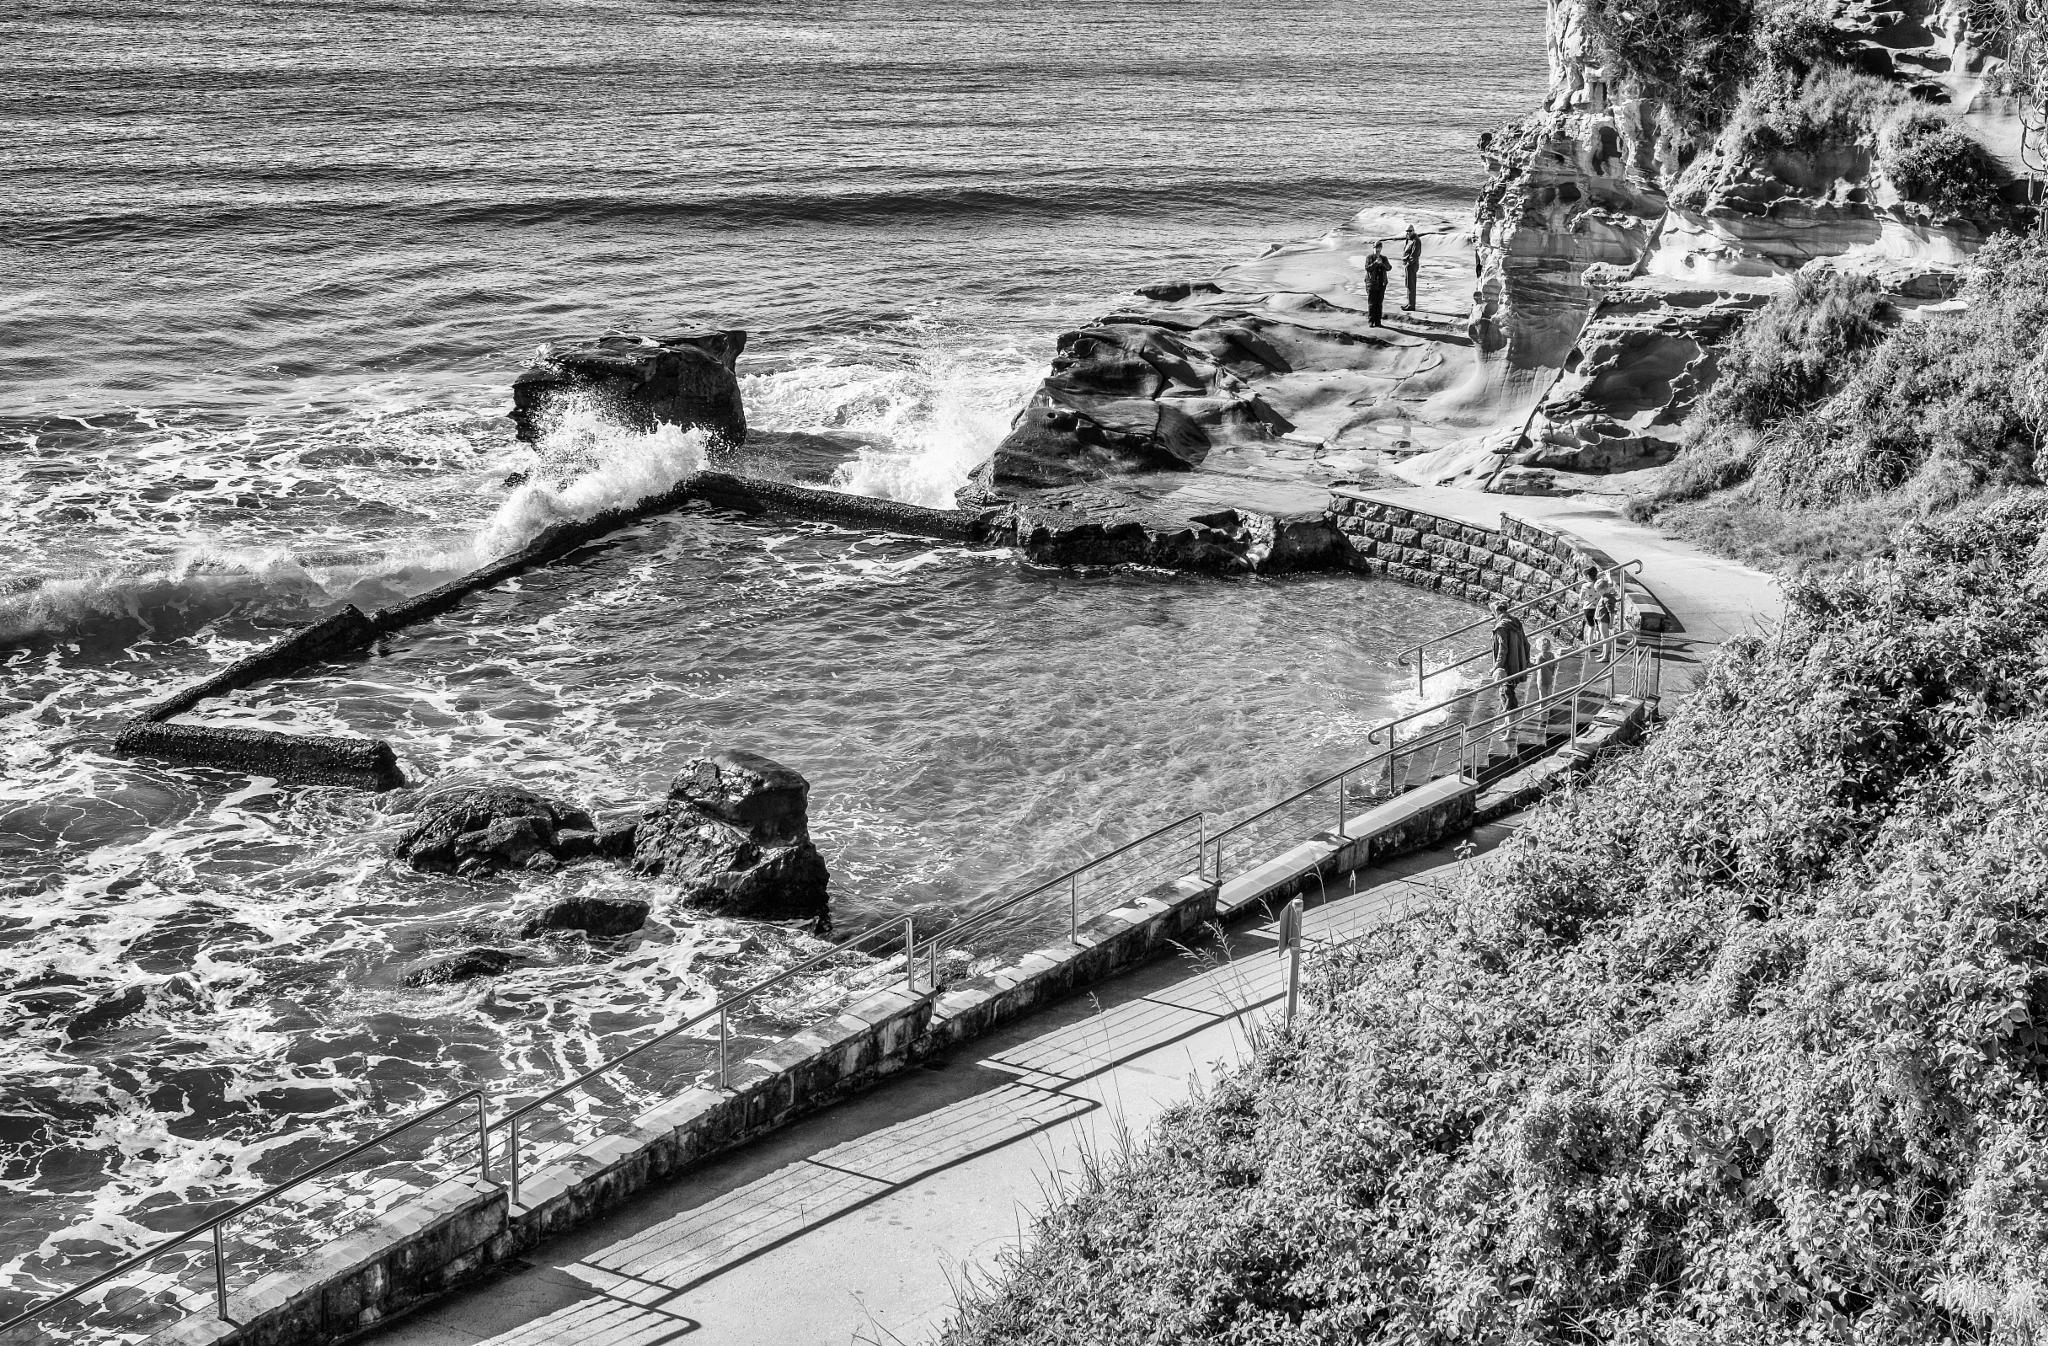 Sea Waves Swamp the Sea Baths by Paul Donohoe